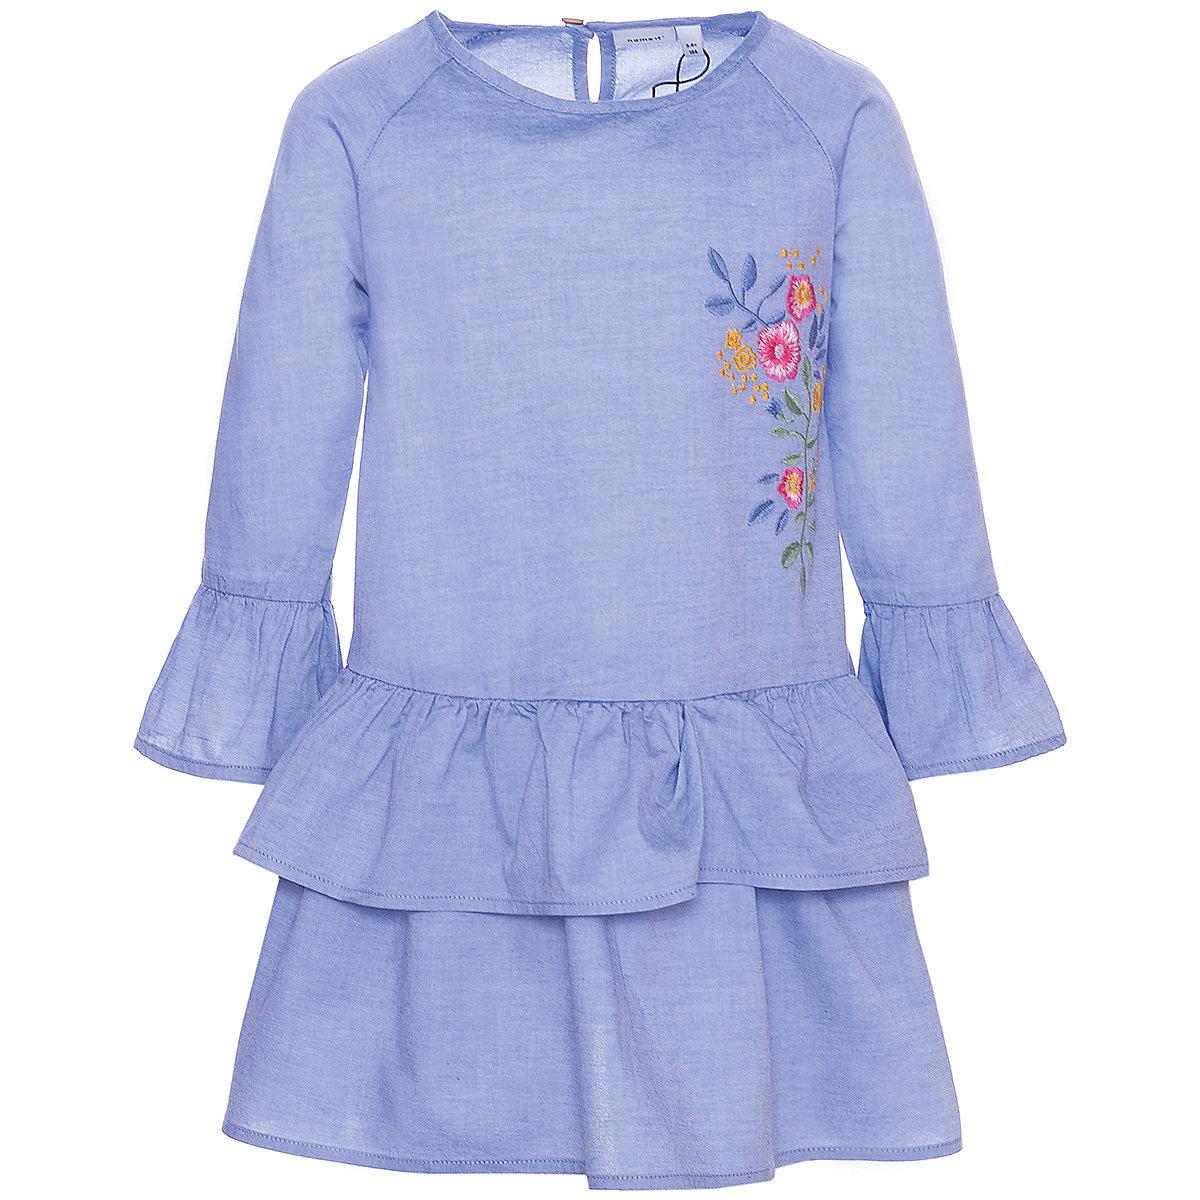 NAME IT Dresses 10624813 dress for girls baby clothing fashion slim family long sleeve mesh dress for girls